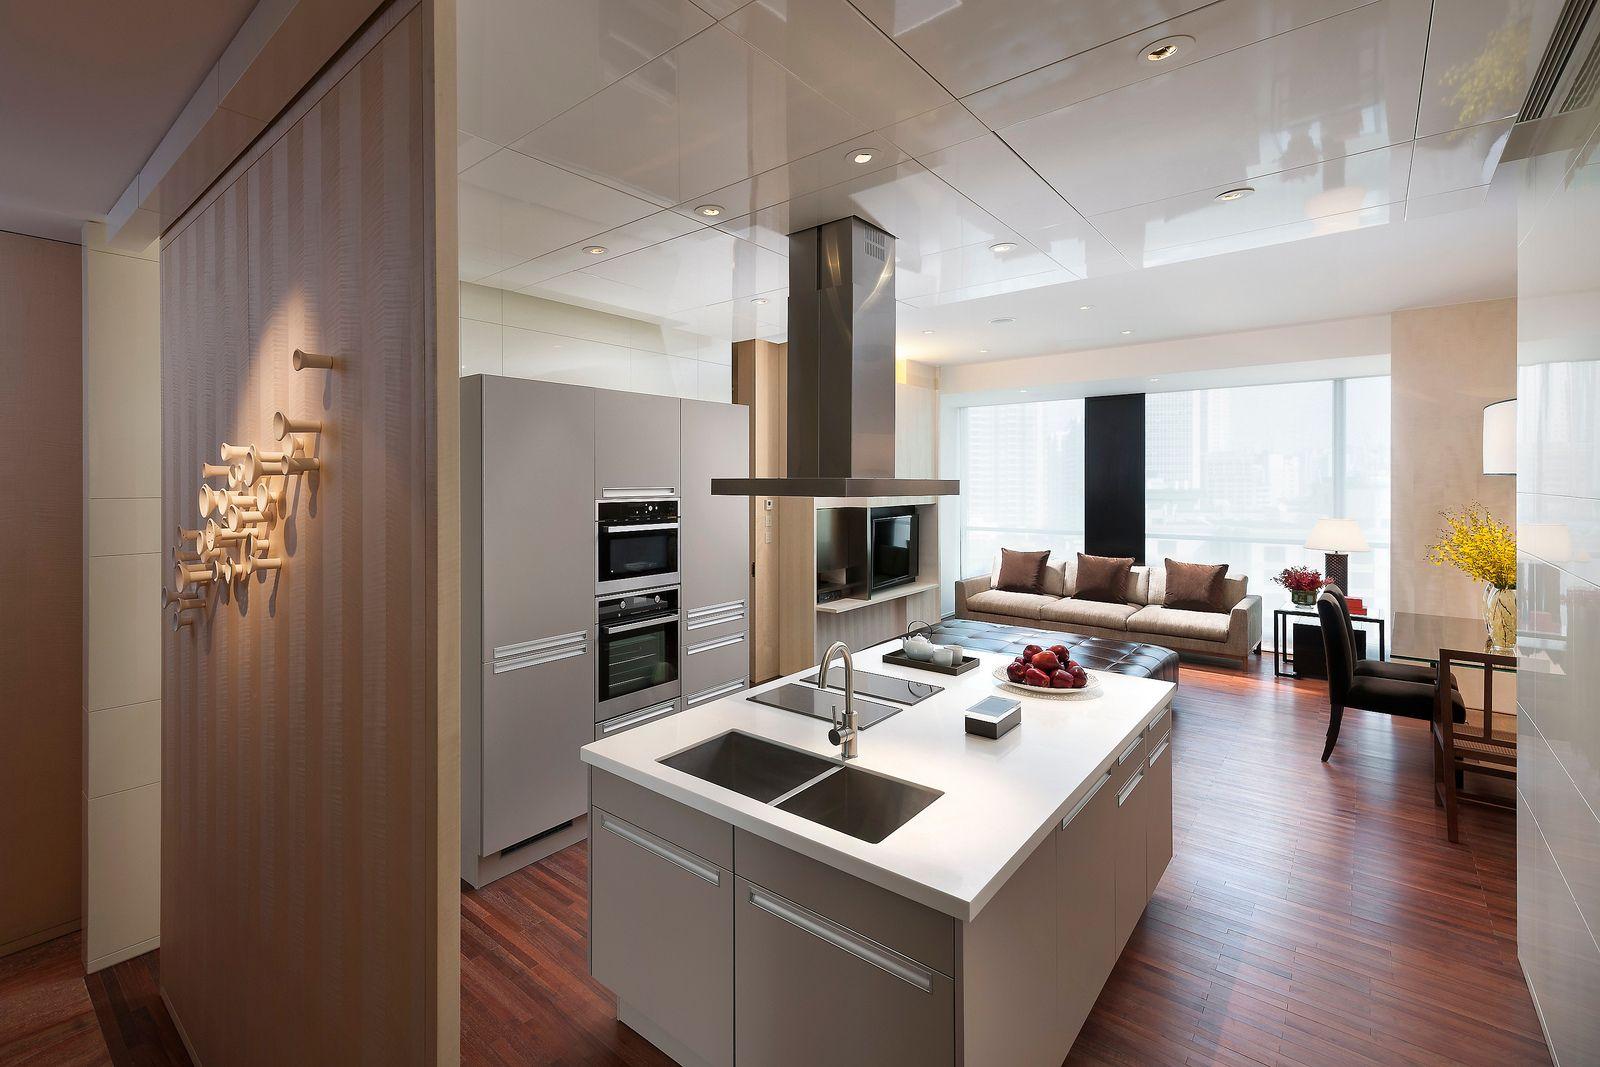 2 bedroom interior design bedroom service apartment at mandarin oriental guangzhou  por